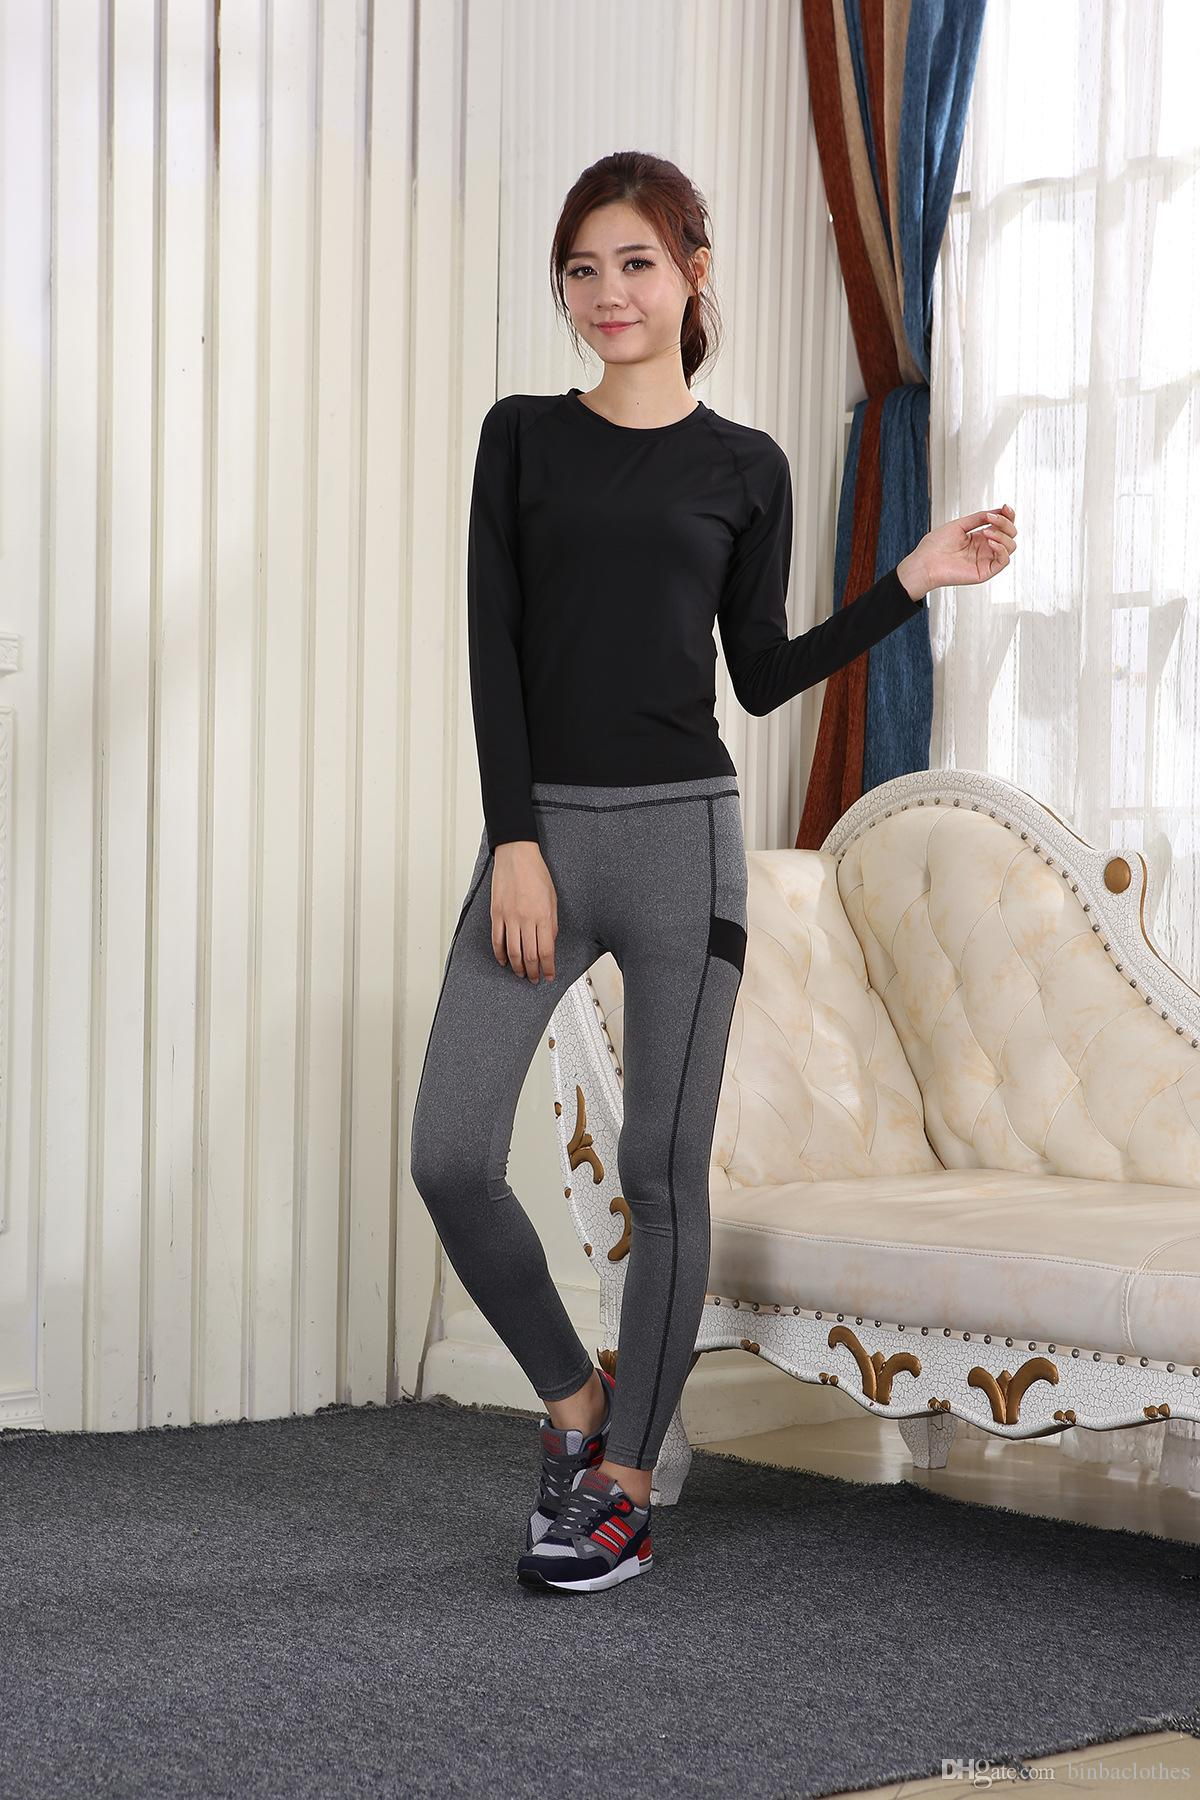 001aa0d88c Women Long-Sleeve Sportswear Set High Waist Yoga Pant Fitness ...